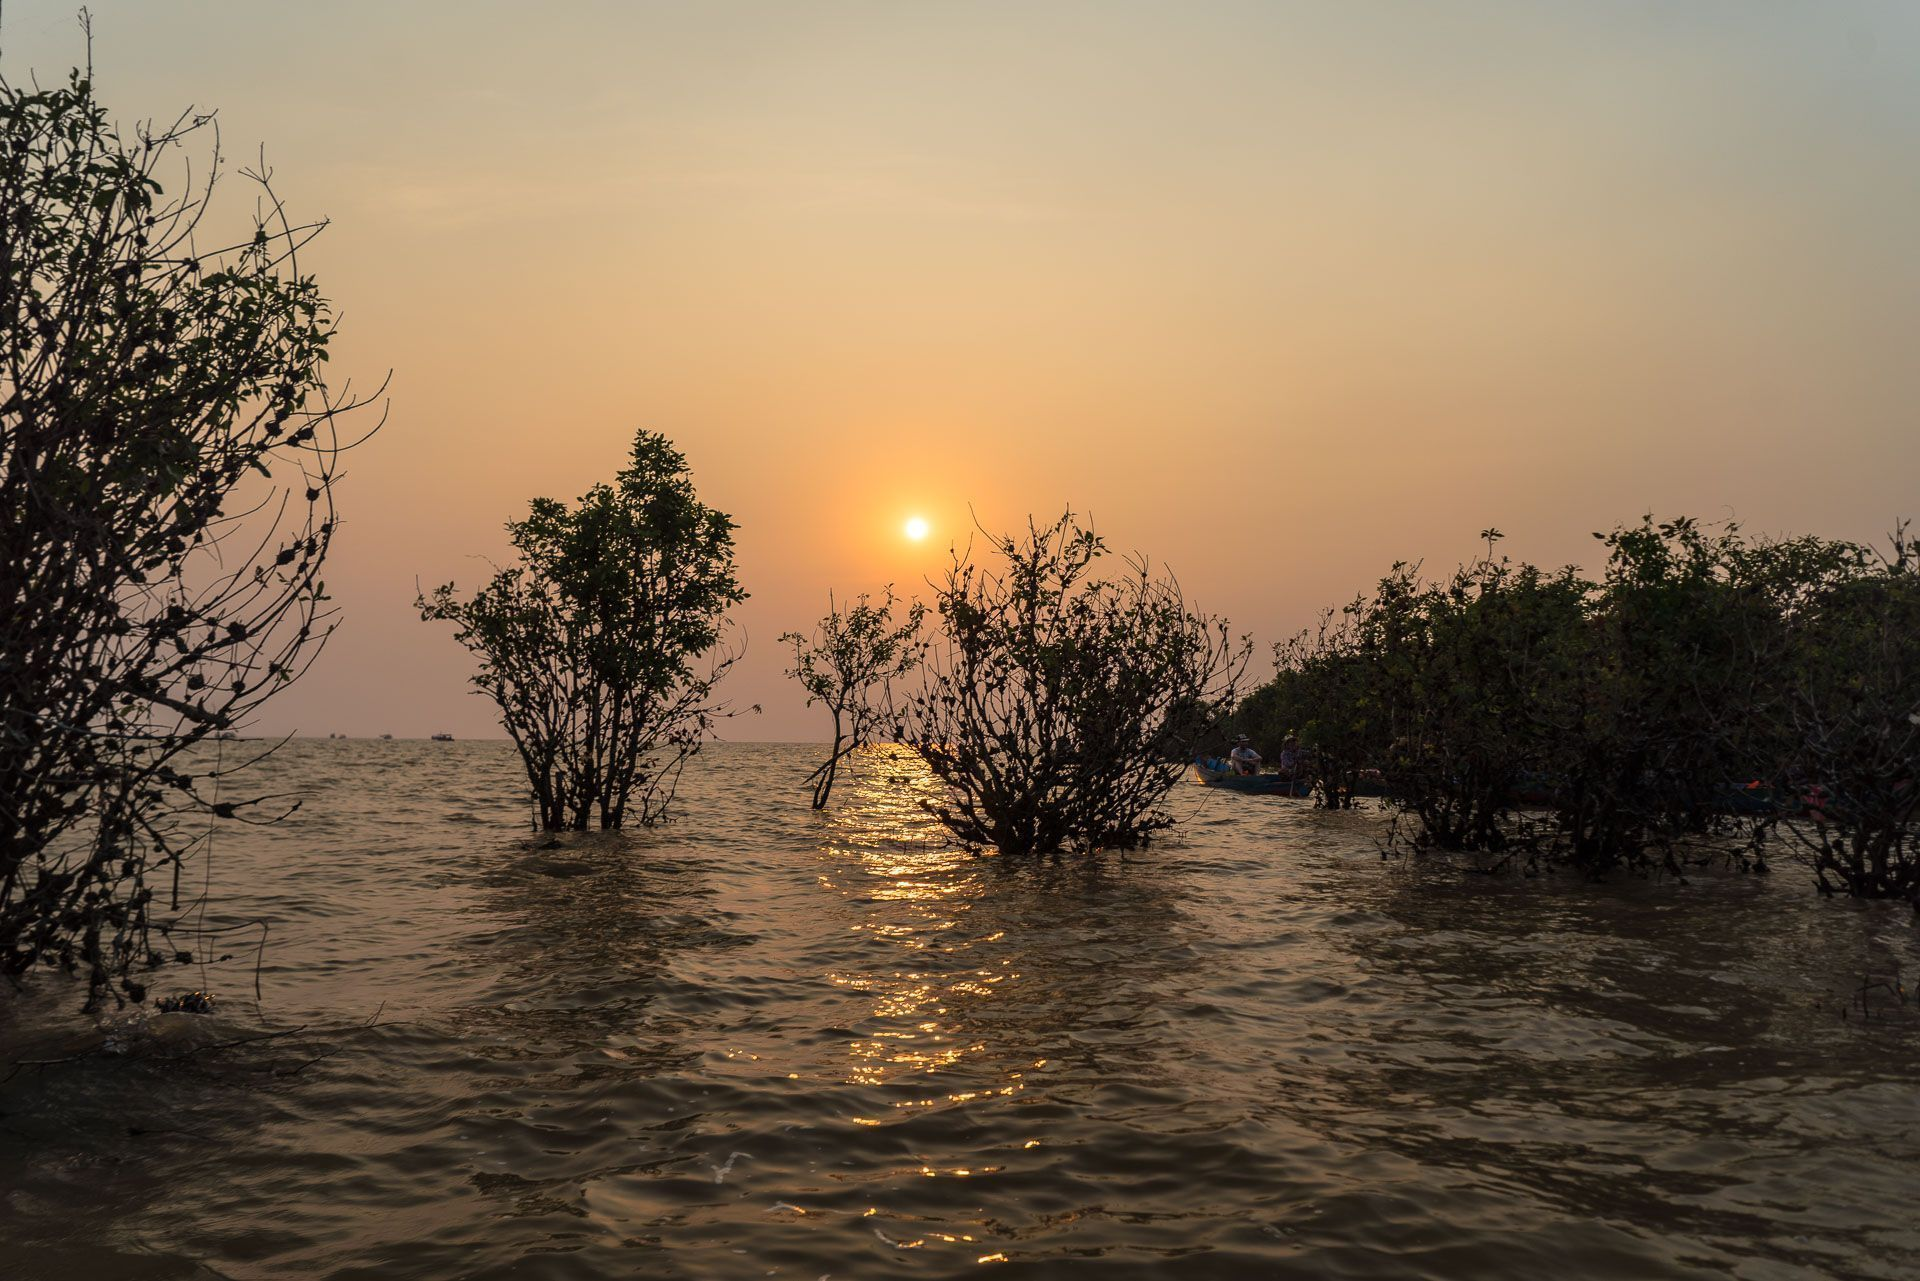 Lesvoyageuses-guide-voyage-siem-reap-angkor-cambodge-lavender-jeep-18